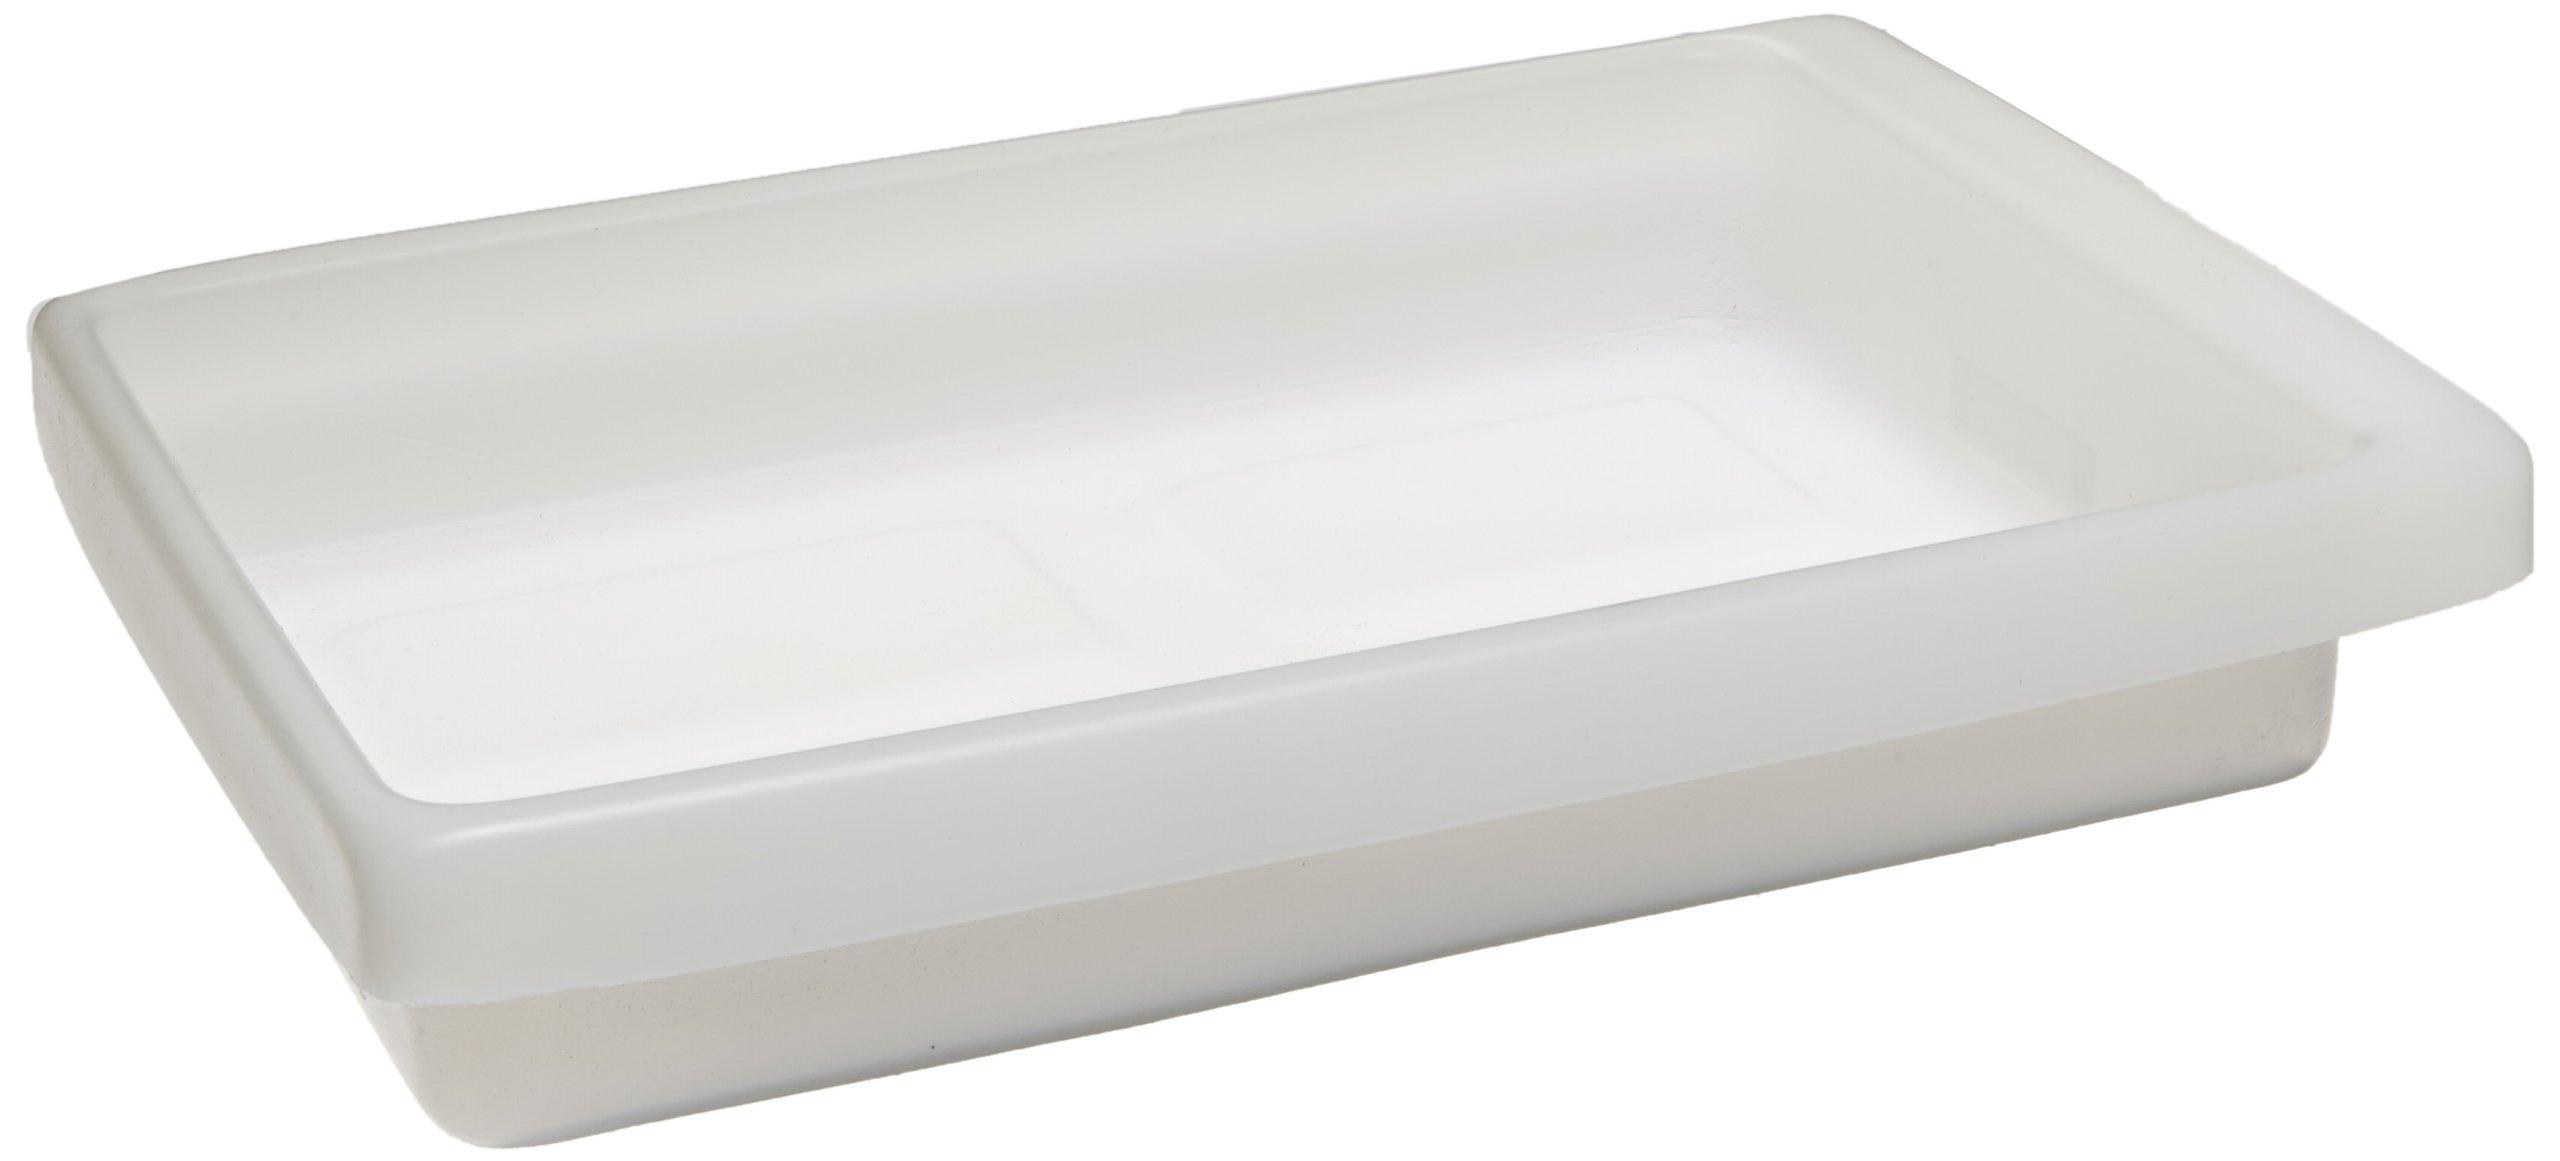 Justrite 24193 Sump Tray, 31-5/8'' Width x 18'' Depth, For Blue Polyethylene Storage Cabinets